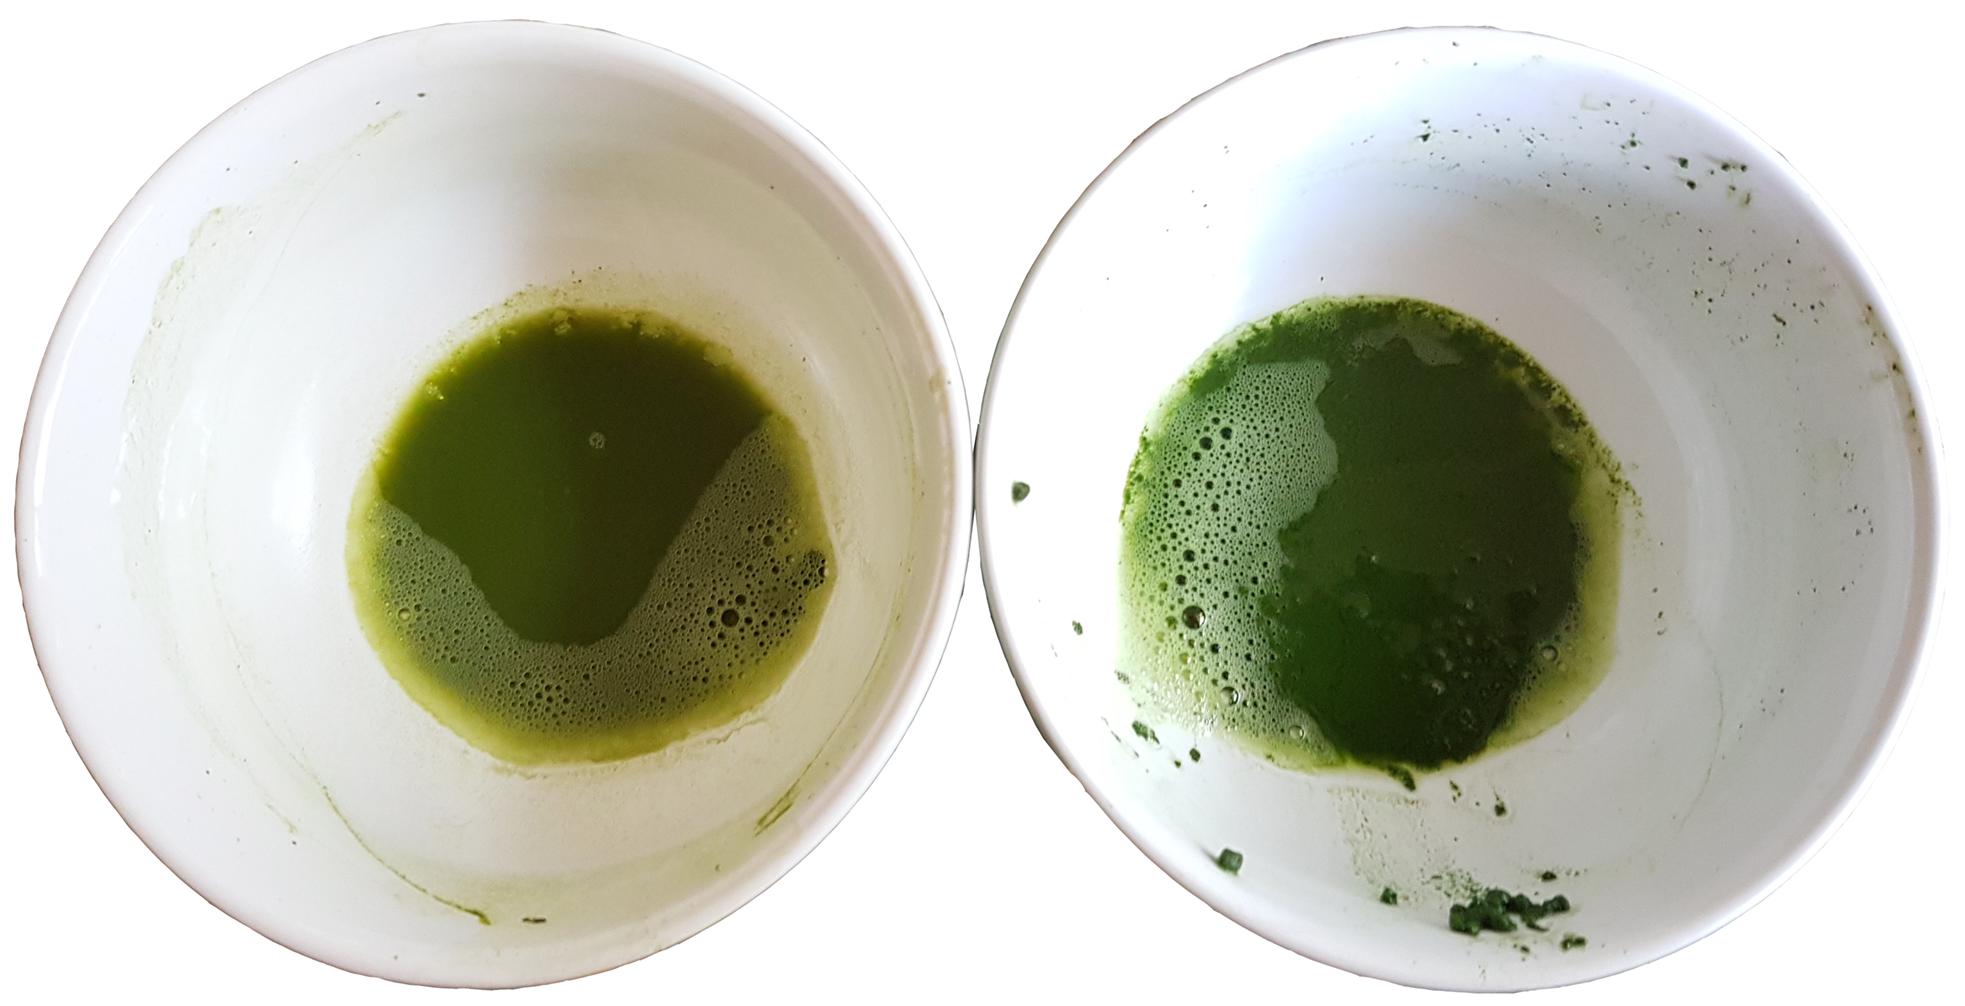 Tea Total Malcha Wang San Yang Matcha